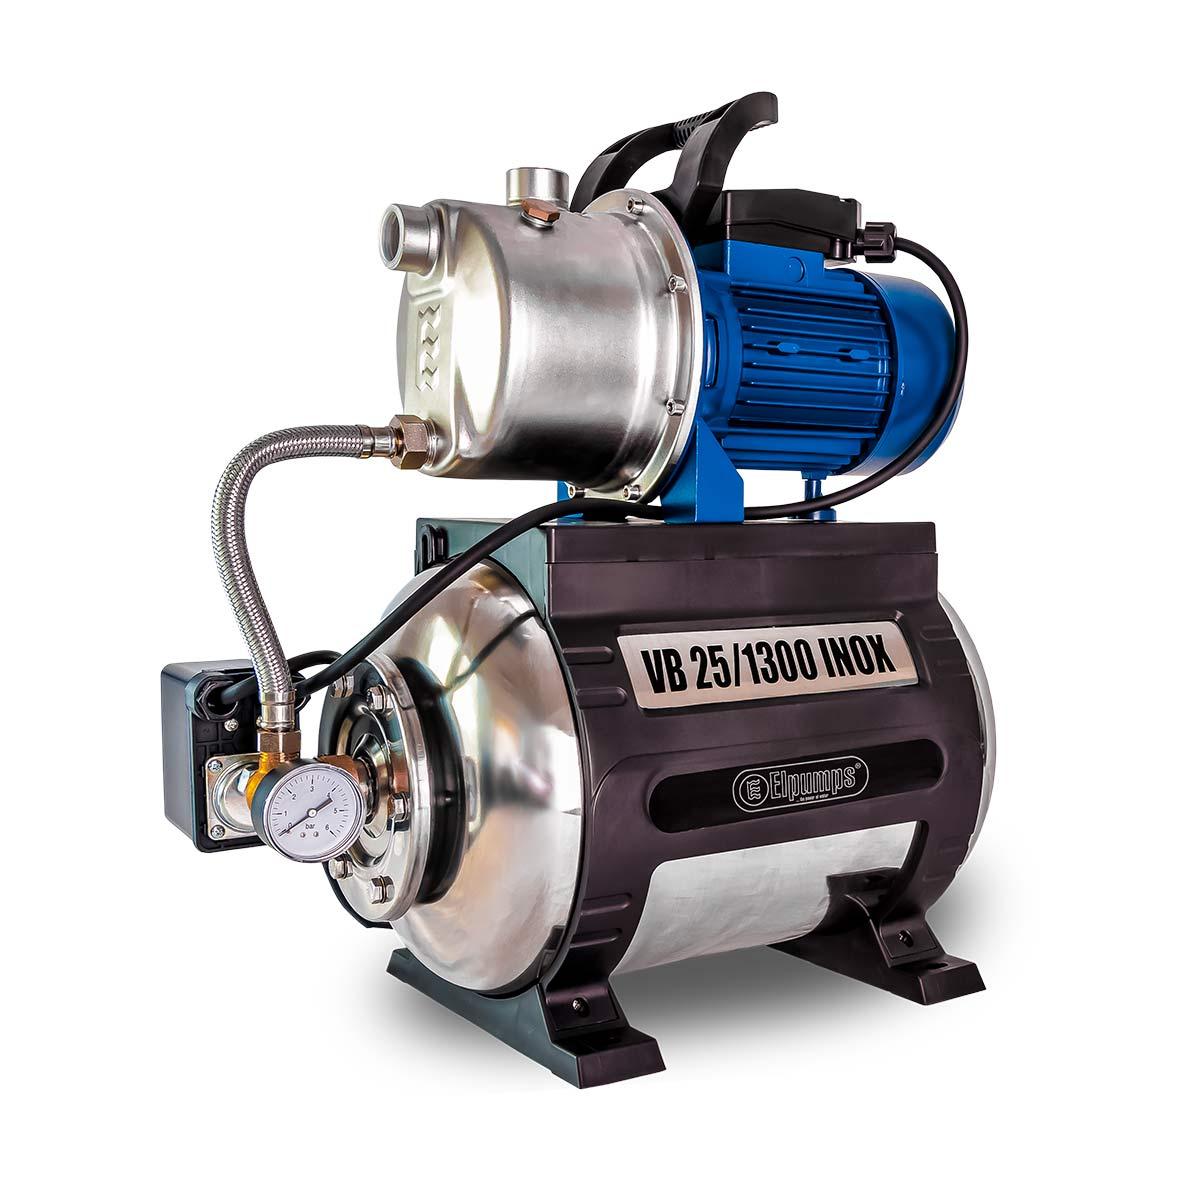 Hauswasserwerk VB 25/1300 INOX, H max 48.0 m, Q max 5400 l/h, 1.3 kW, 525 x 295 x 590 mm, 1' IG, 230 V